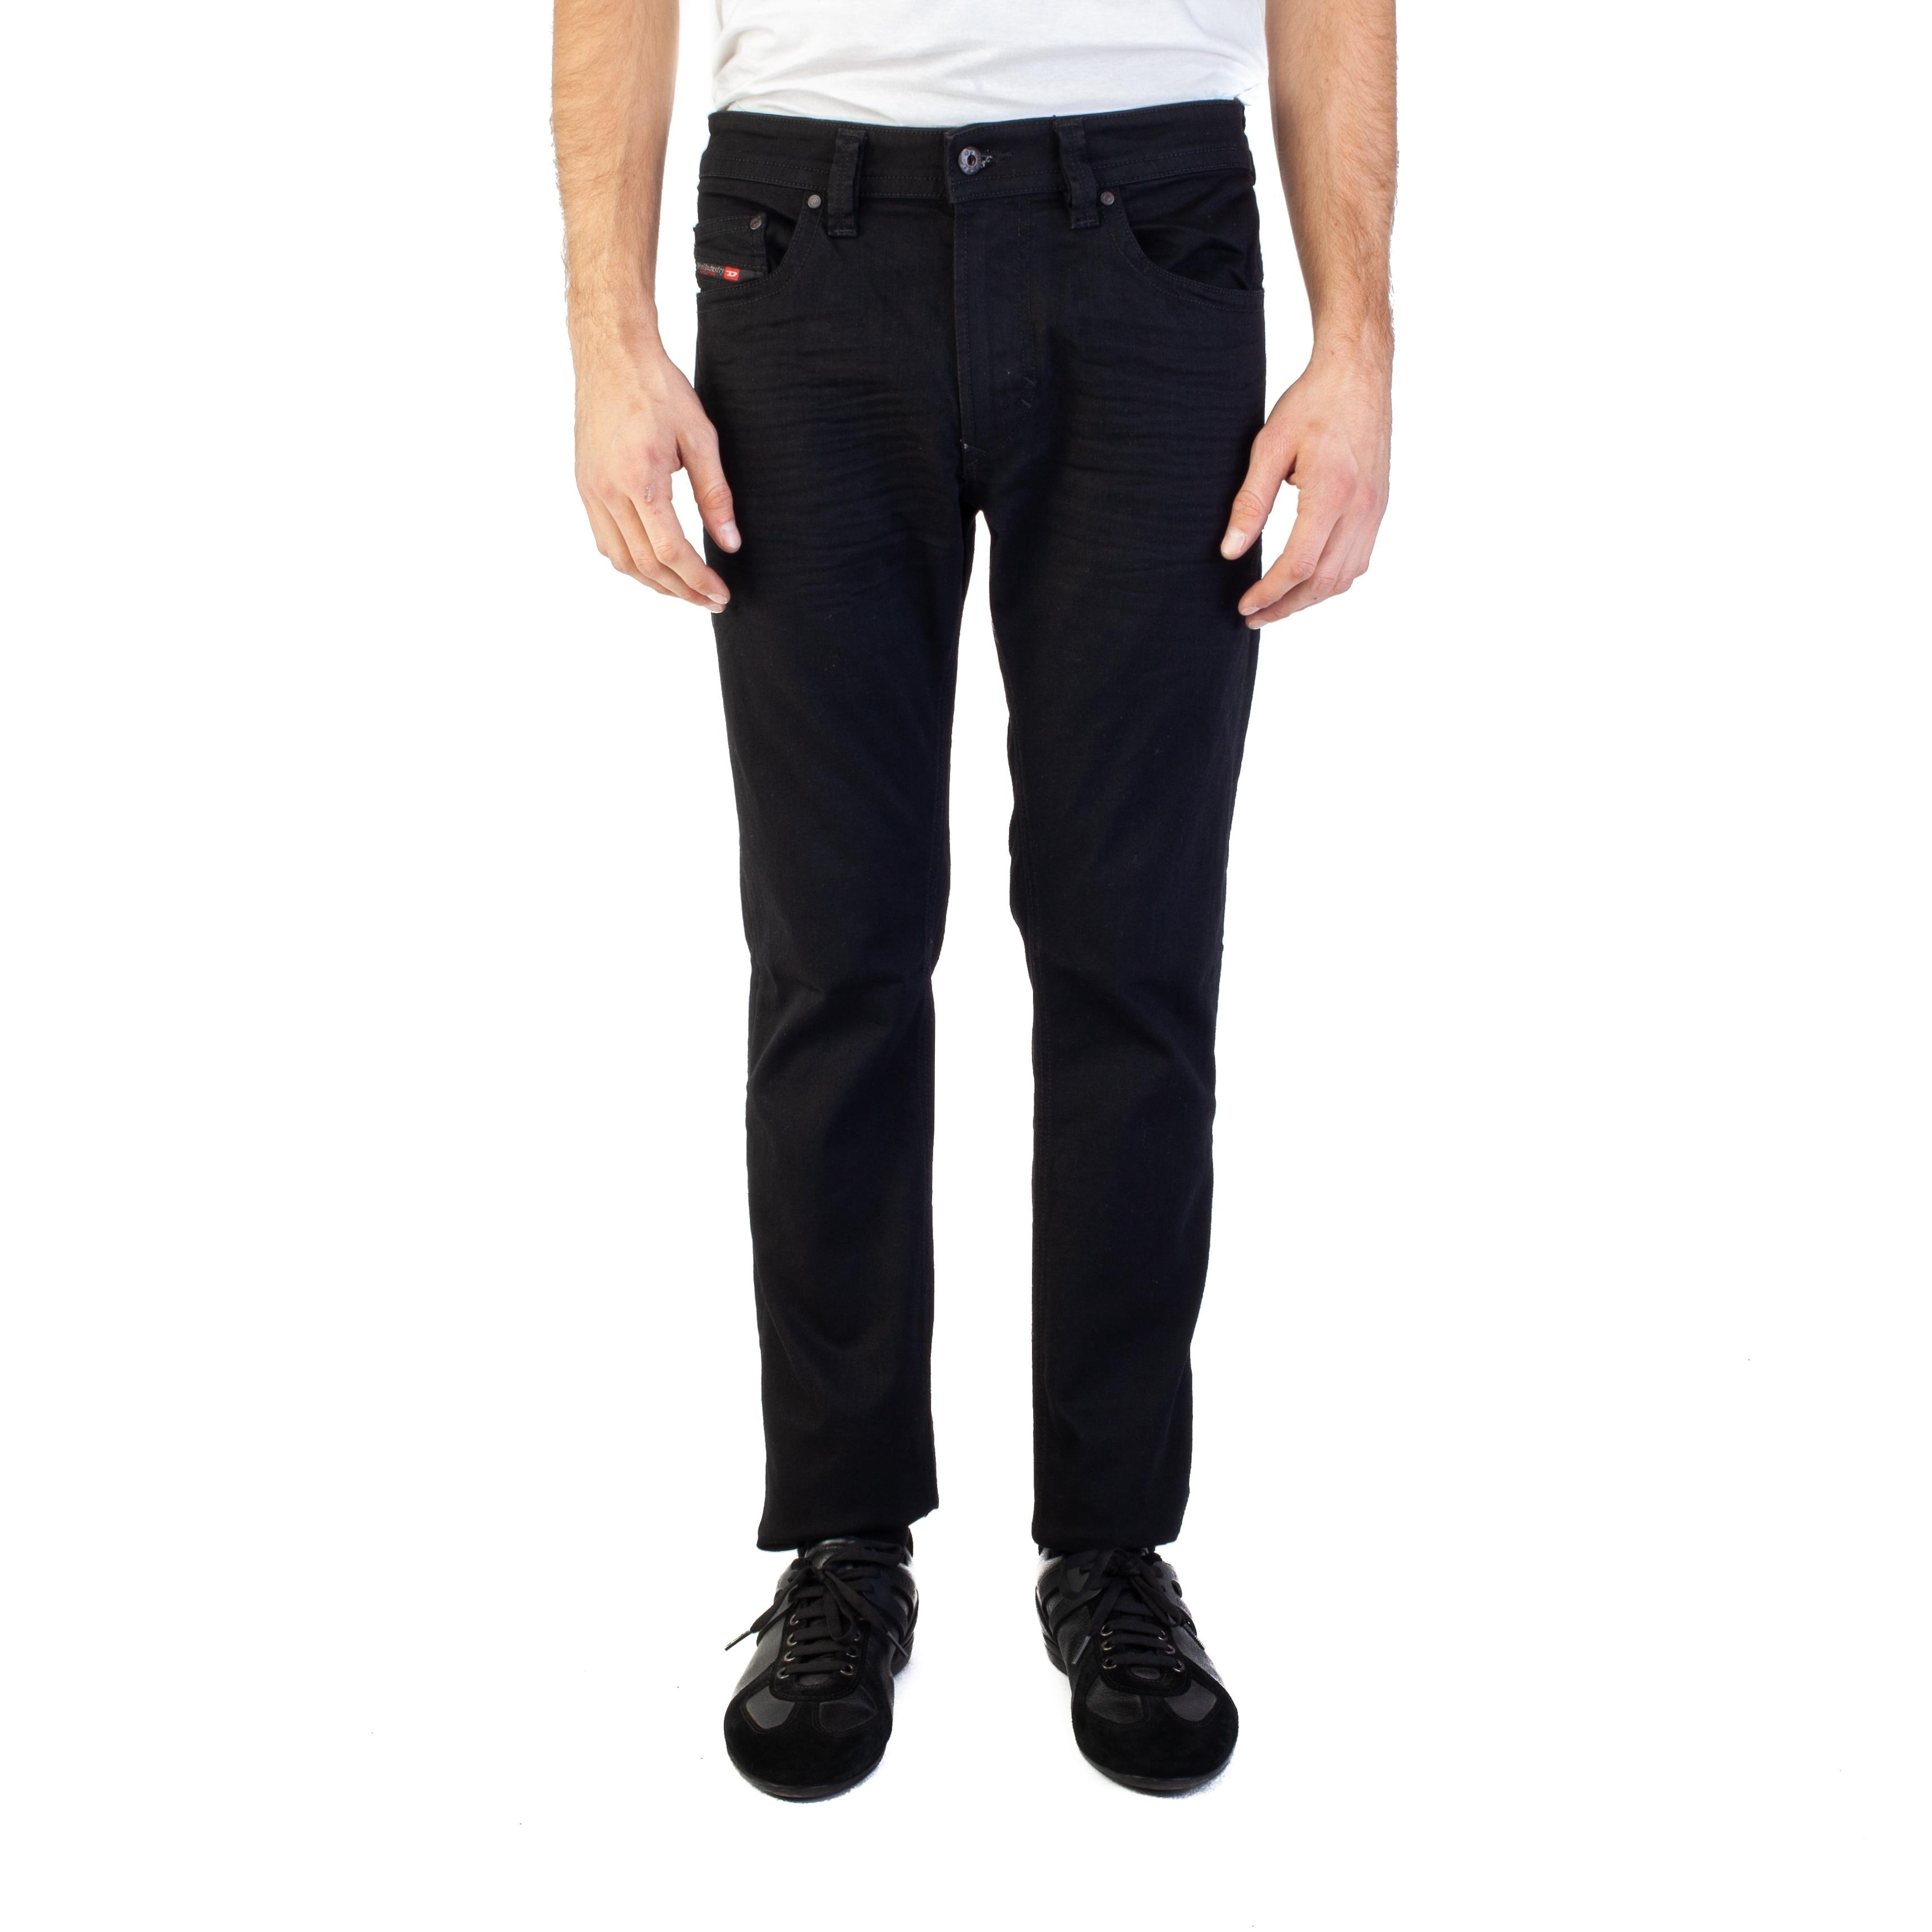 3eed406545a Shop Diesel Men s Slim-Skinny Fit Thavar 0R84A Stretch Jean Pants ...